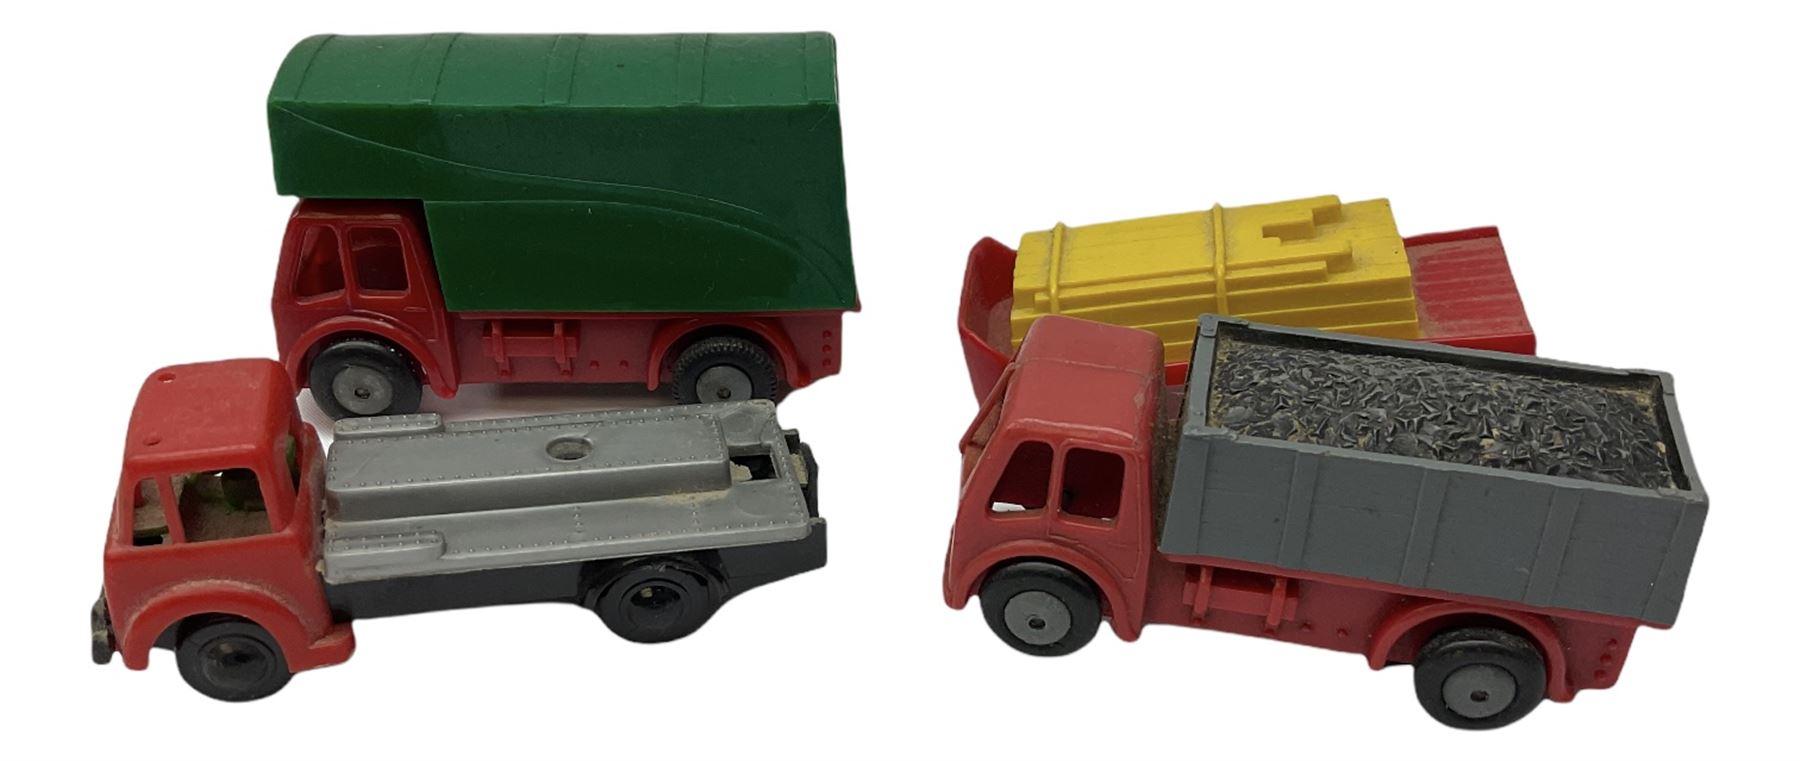 Tri-ang/Tri-ang Minic - twelve plastic friction-drive vehicles comprising Tri-ang Toys/Pedigree Pram - Image 5 of 7